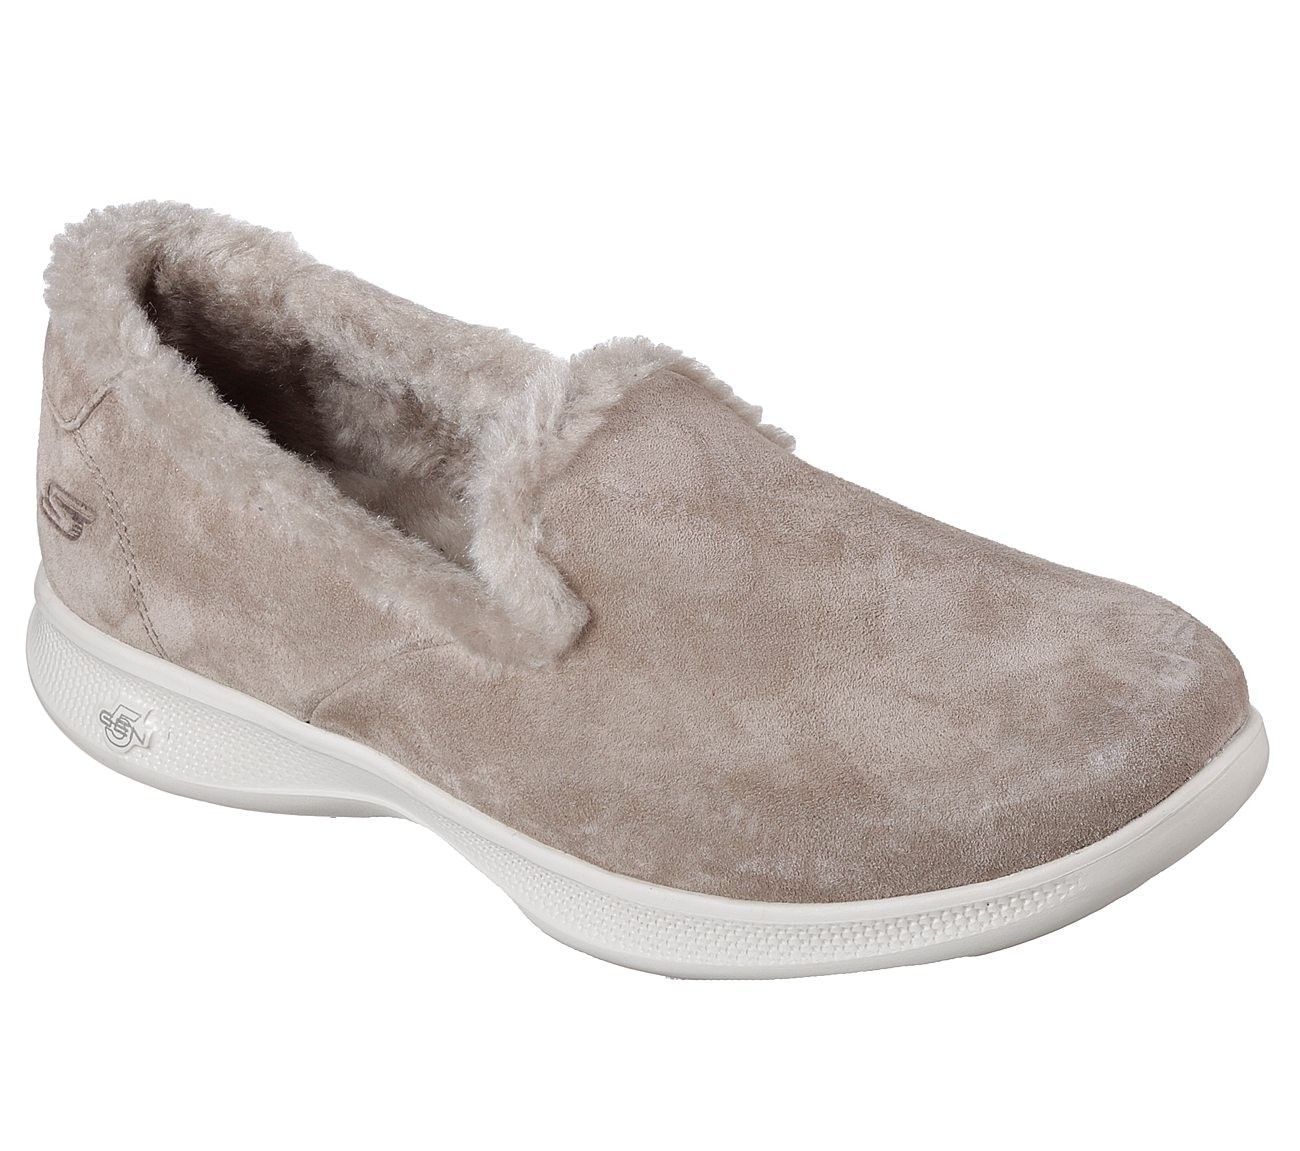 SKECHERS FUZZIES. GO STEP LITE FUZZIES. SKECHERS  65.00   Fashion (scarpe Athletic   b63740